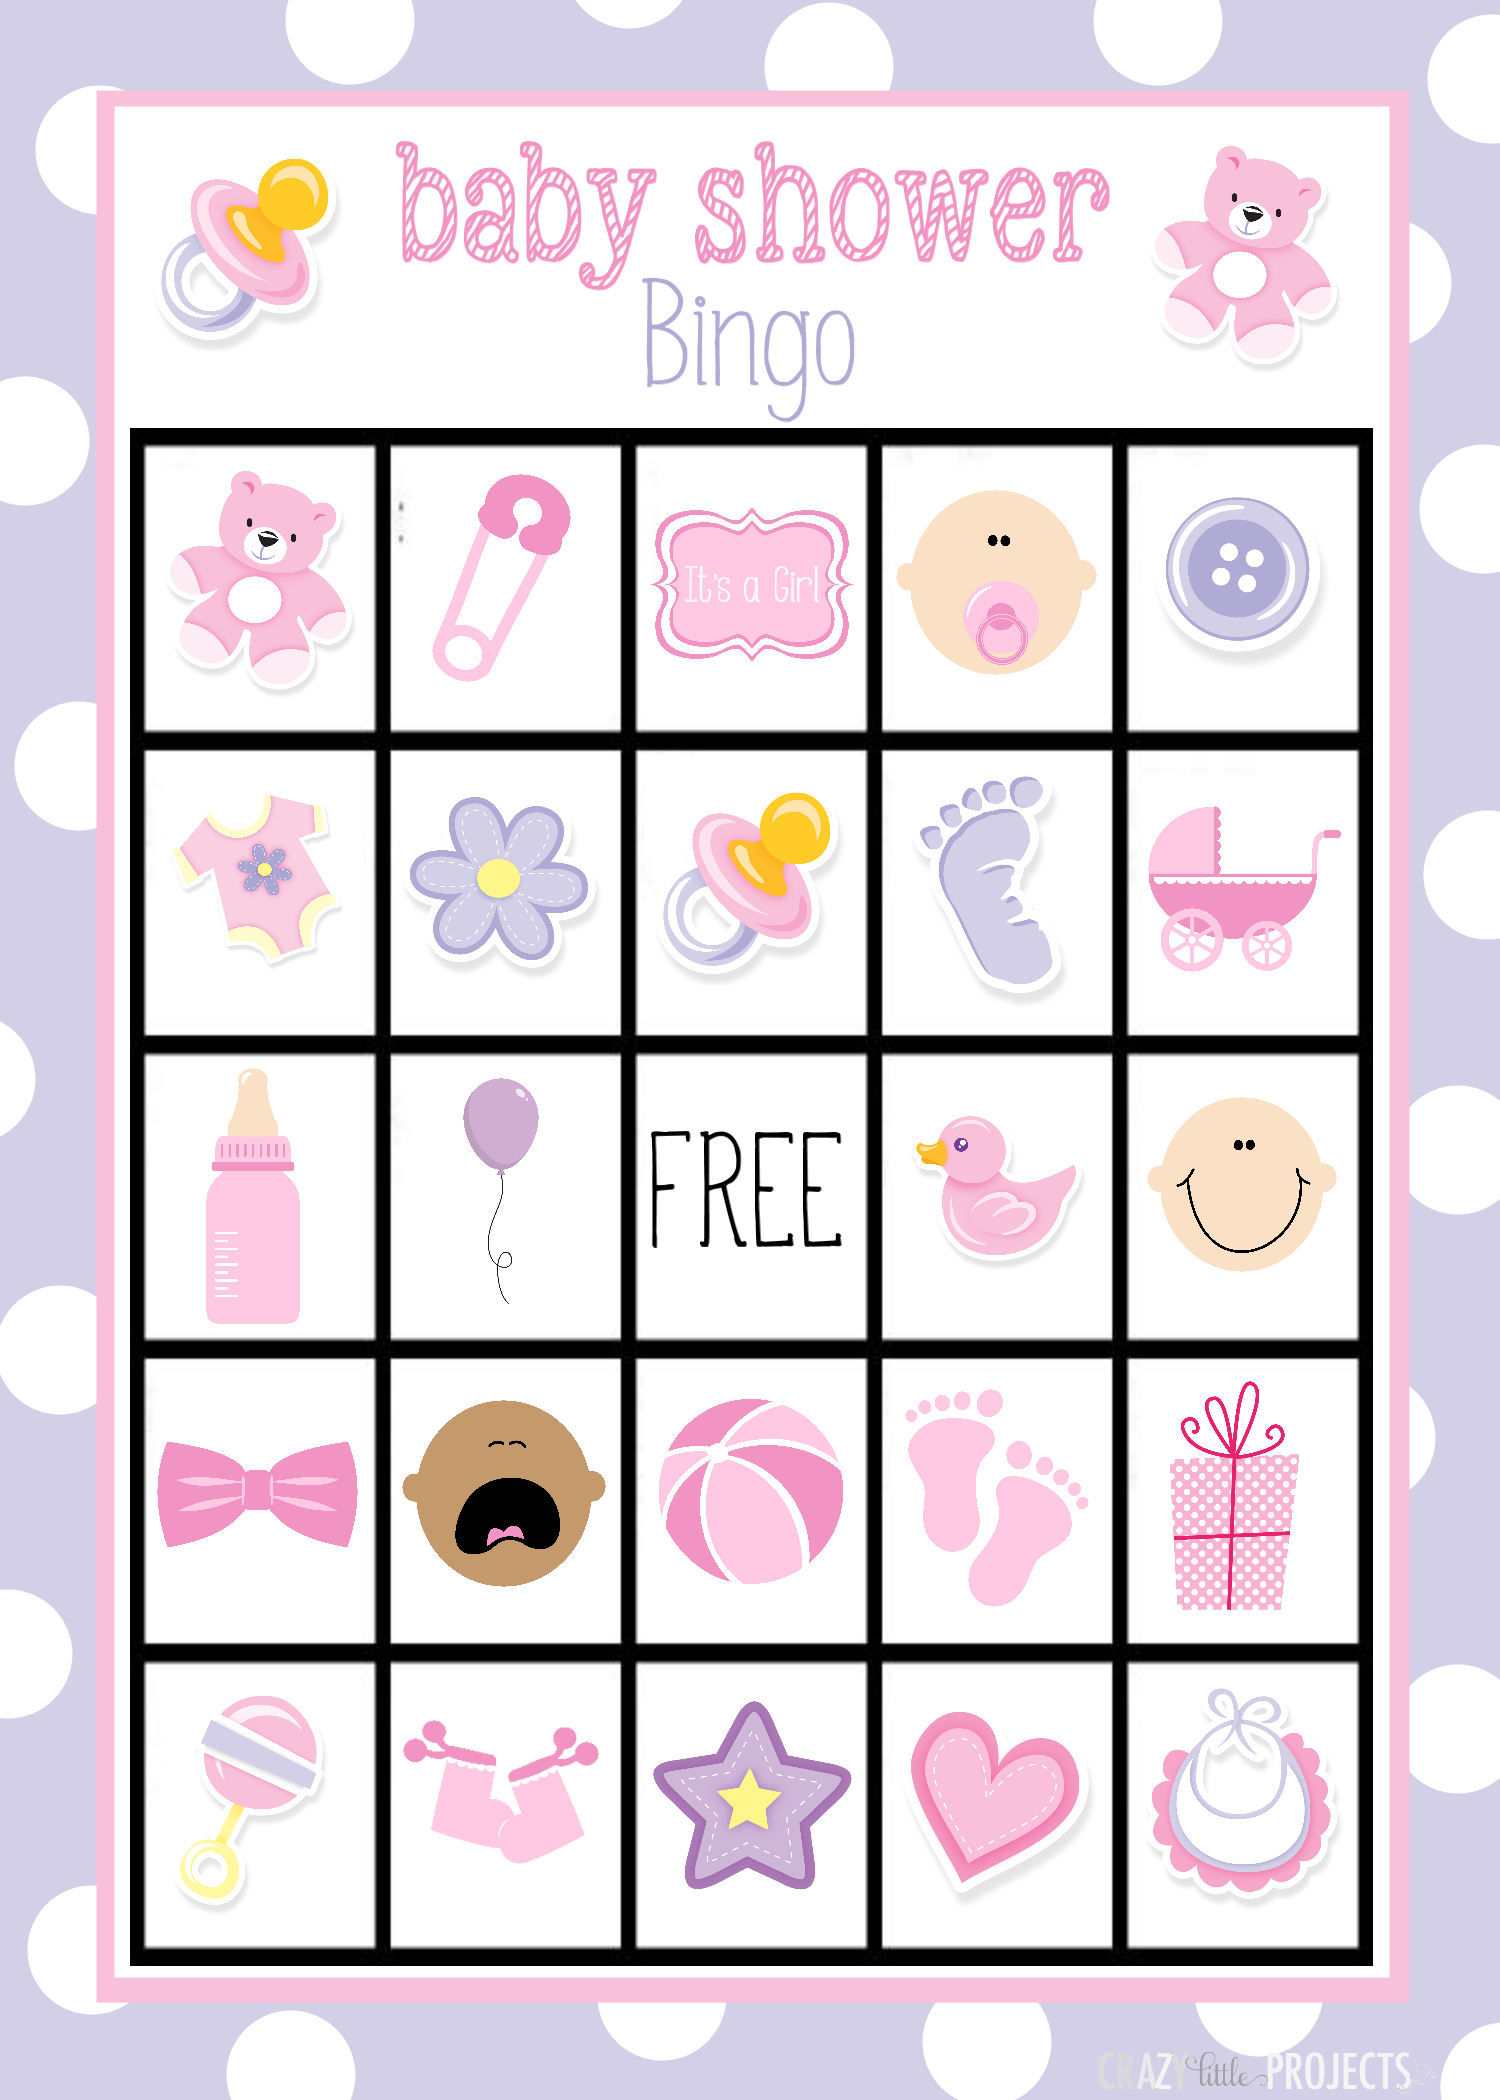 Free Printable Baby Bingo Cards Printable Baby Shower Cards Baby Shower Bingo Bingo Card Template